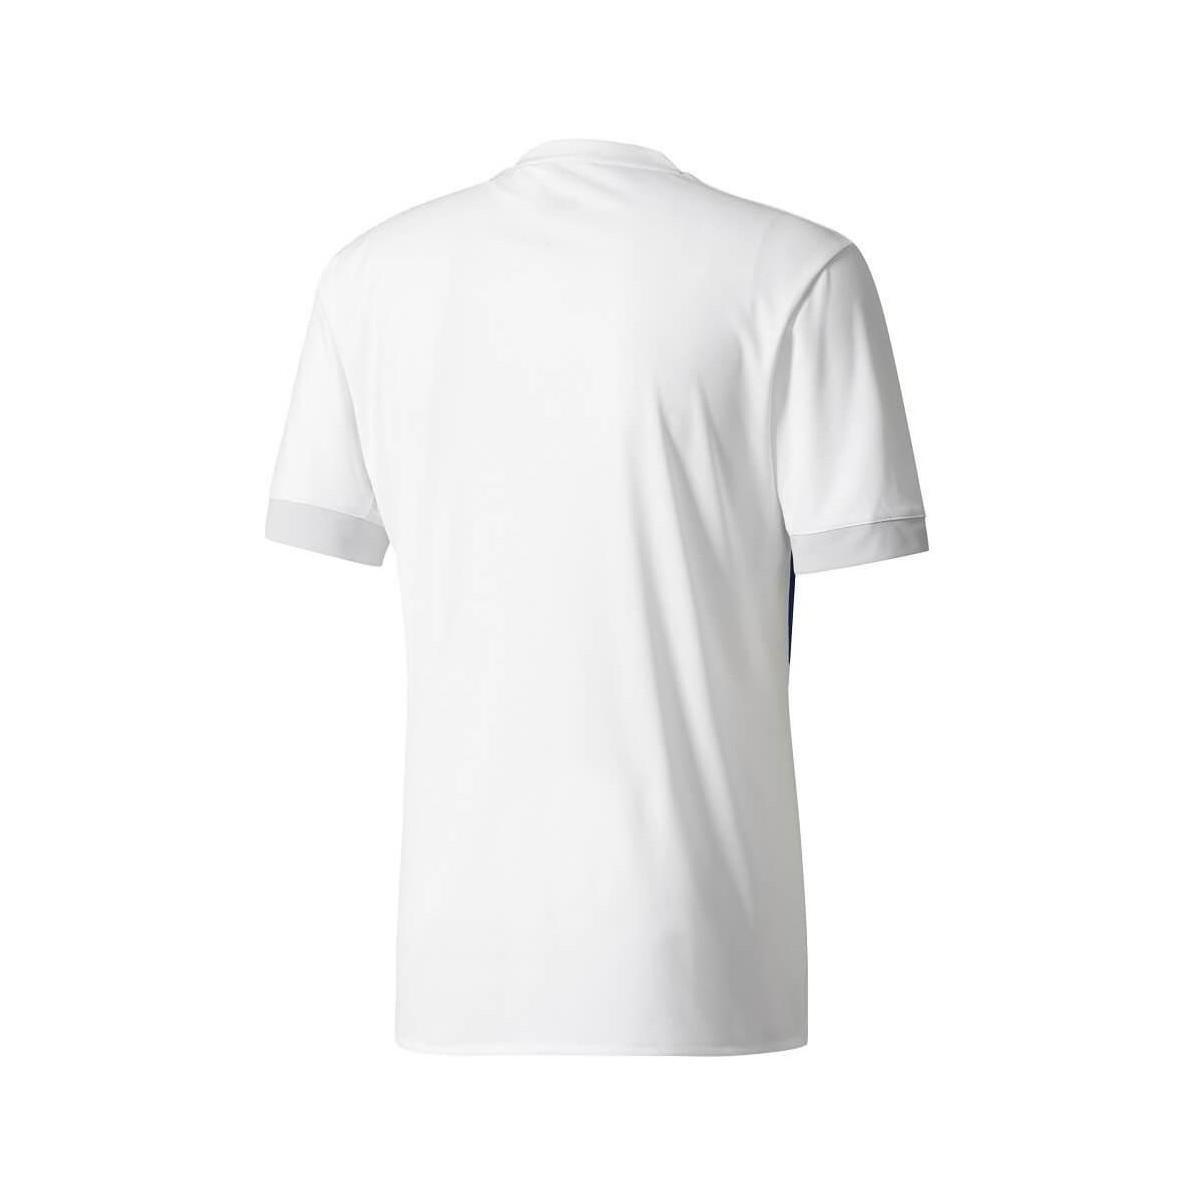 74cad3aae Adidas - 2017-2018 Olympique Lyon Home Football Shirt Women s T Shirt In  White -. View fullscreen